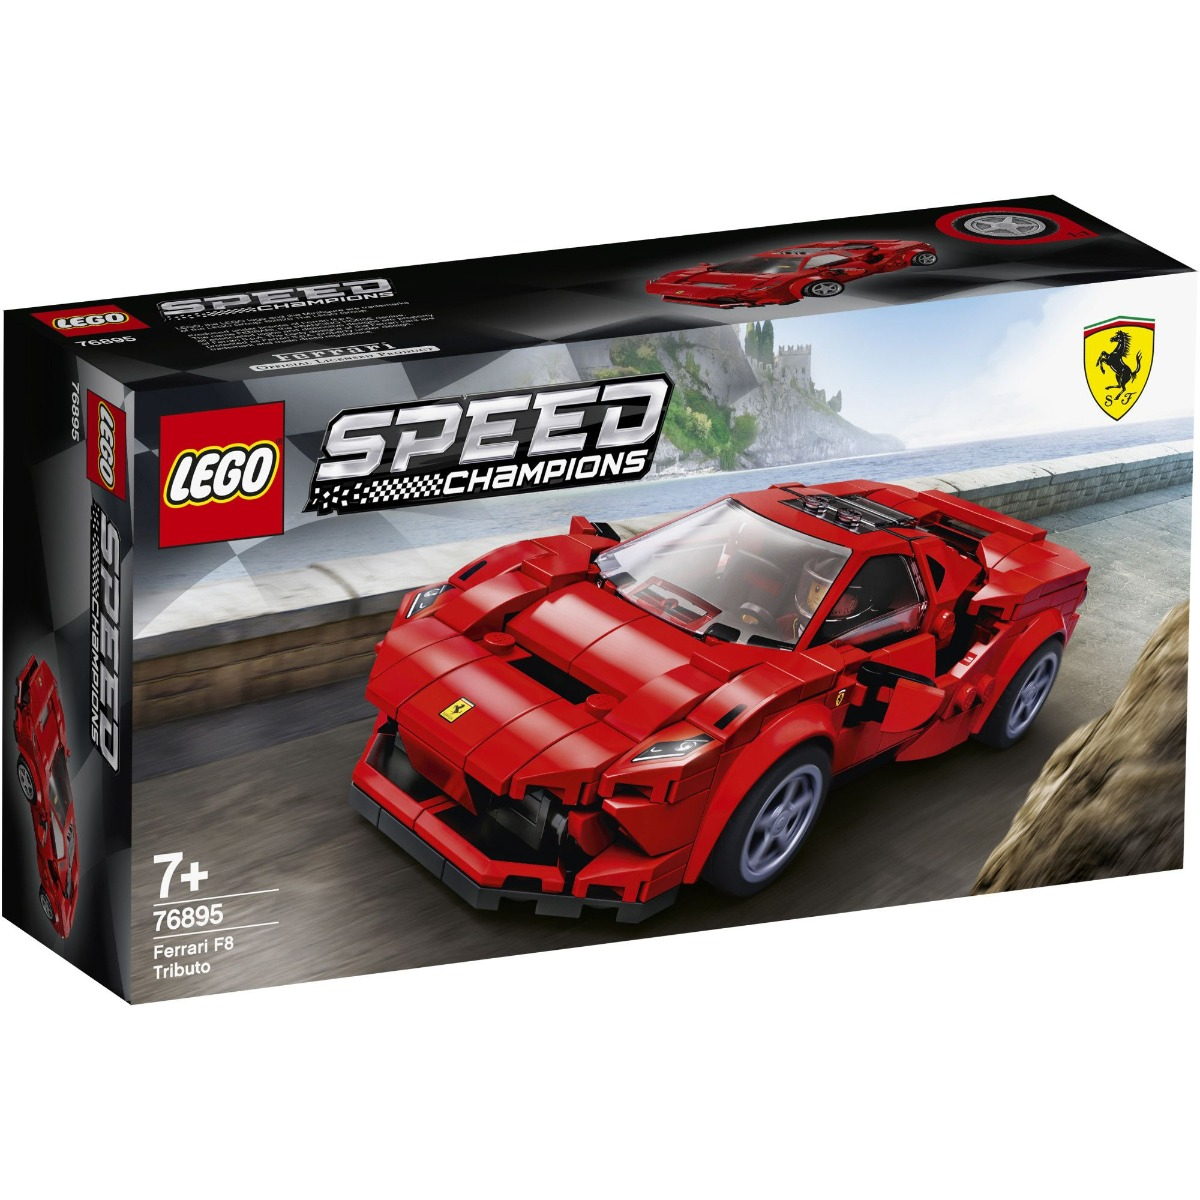 Lego® Speed Champions - Ferarri F8 Tributo (76895)